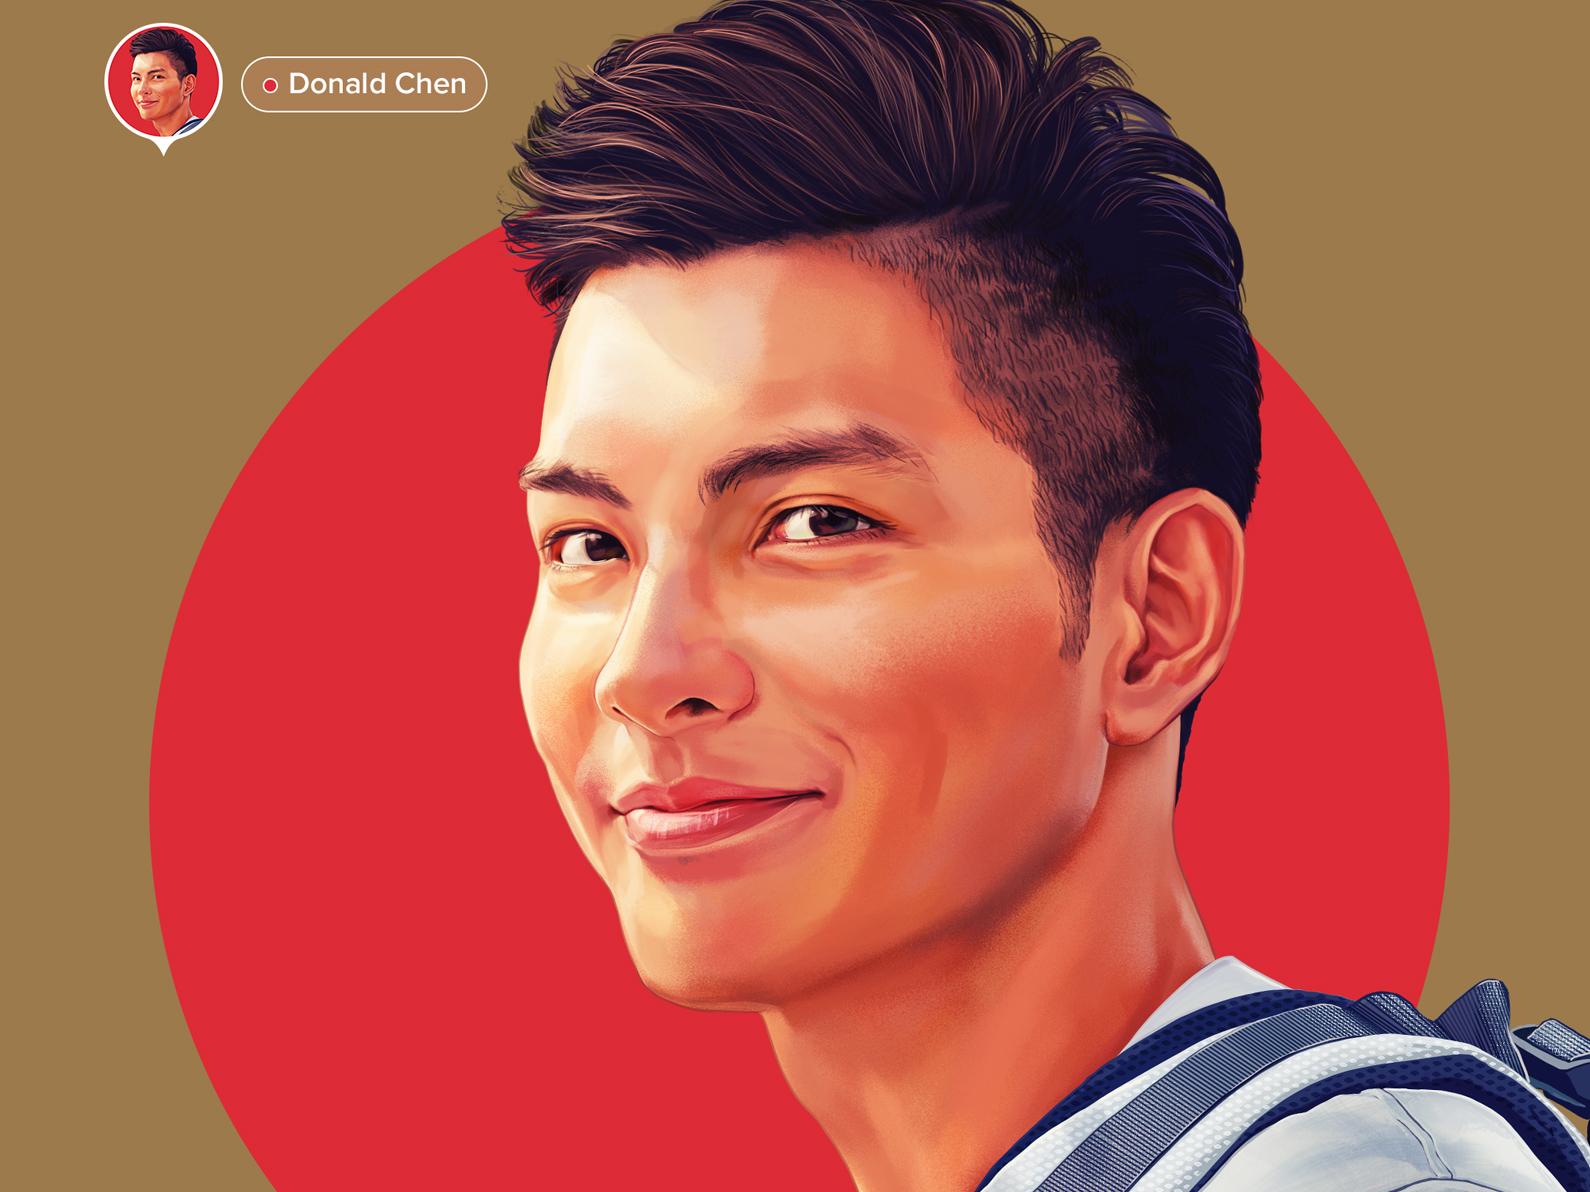 Portraits for onborading screens - Donald Chen illustrator app illustration ui digital color wflemming faces people illustration